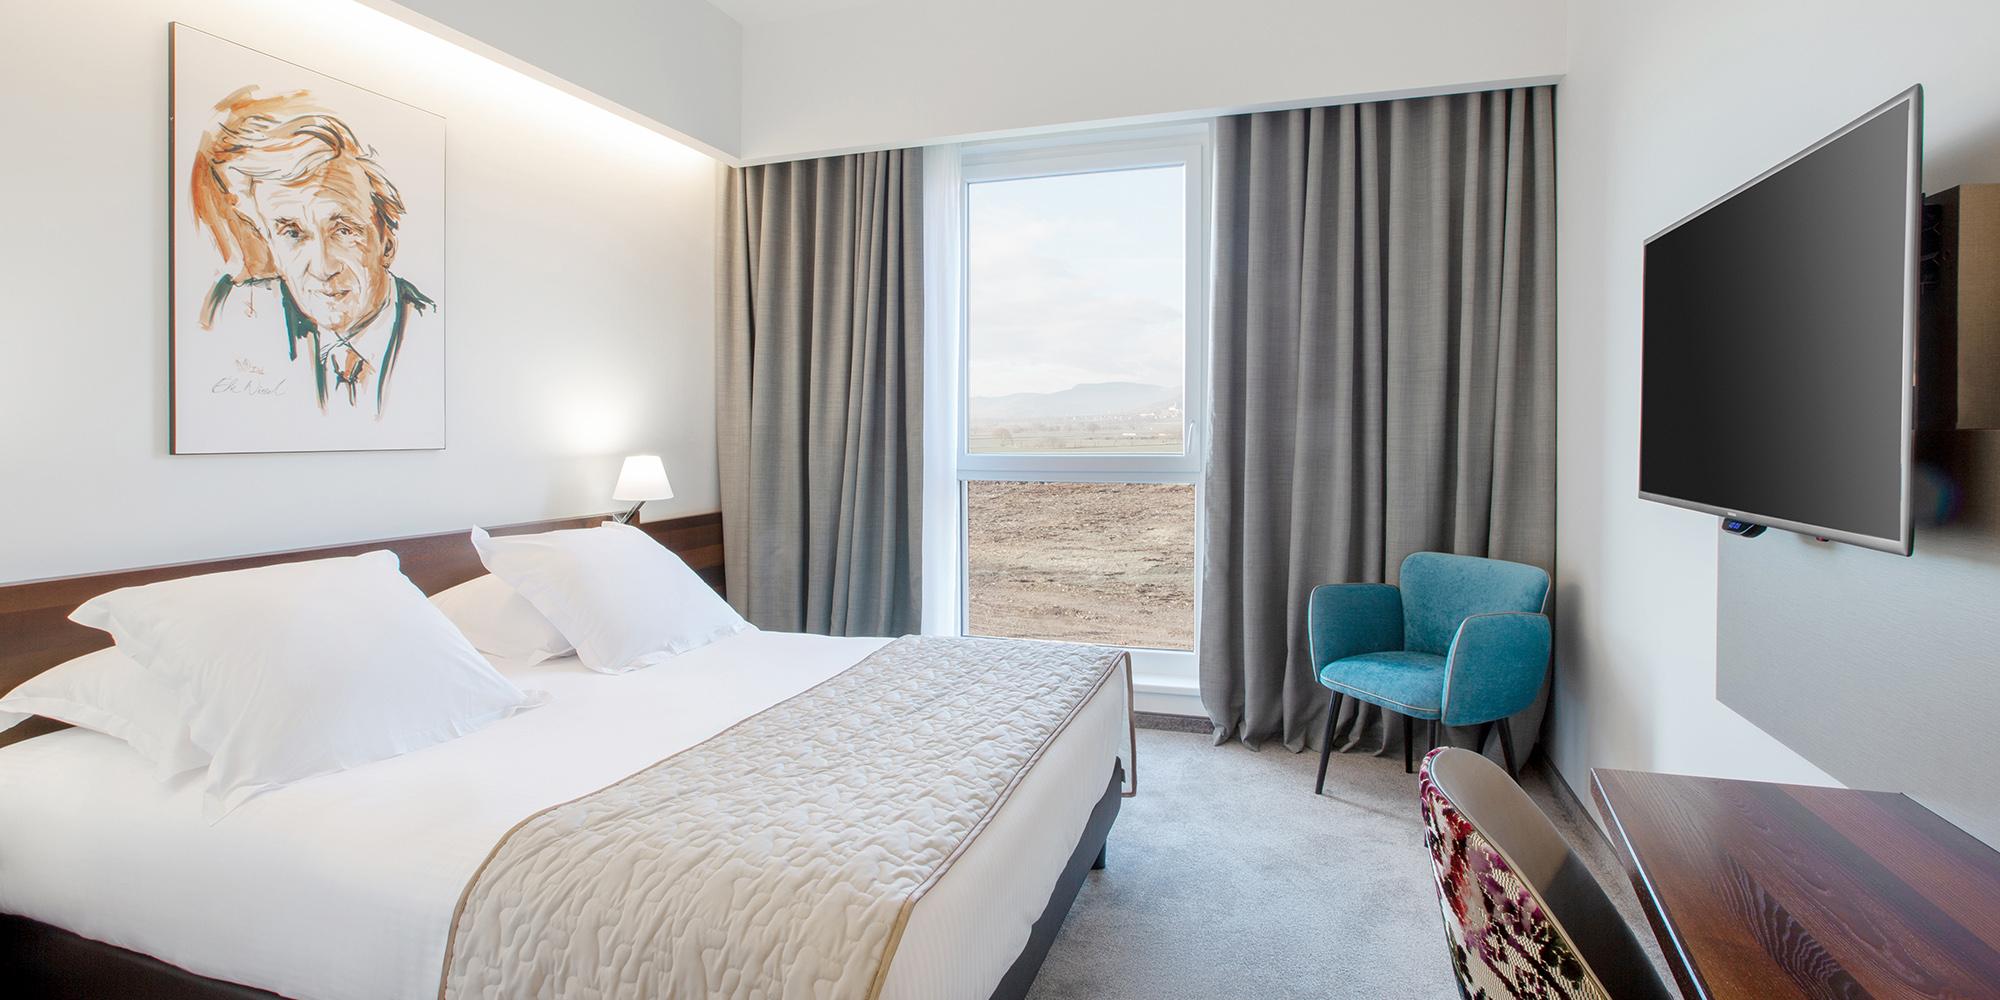 senfa slider hotel blakout curtains acoustic panel